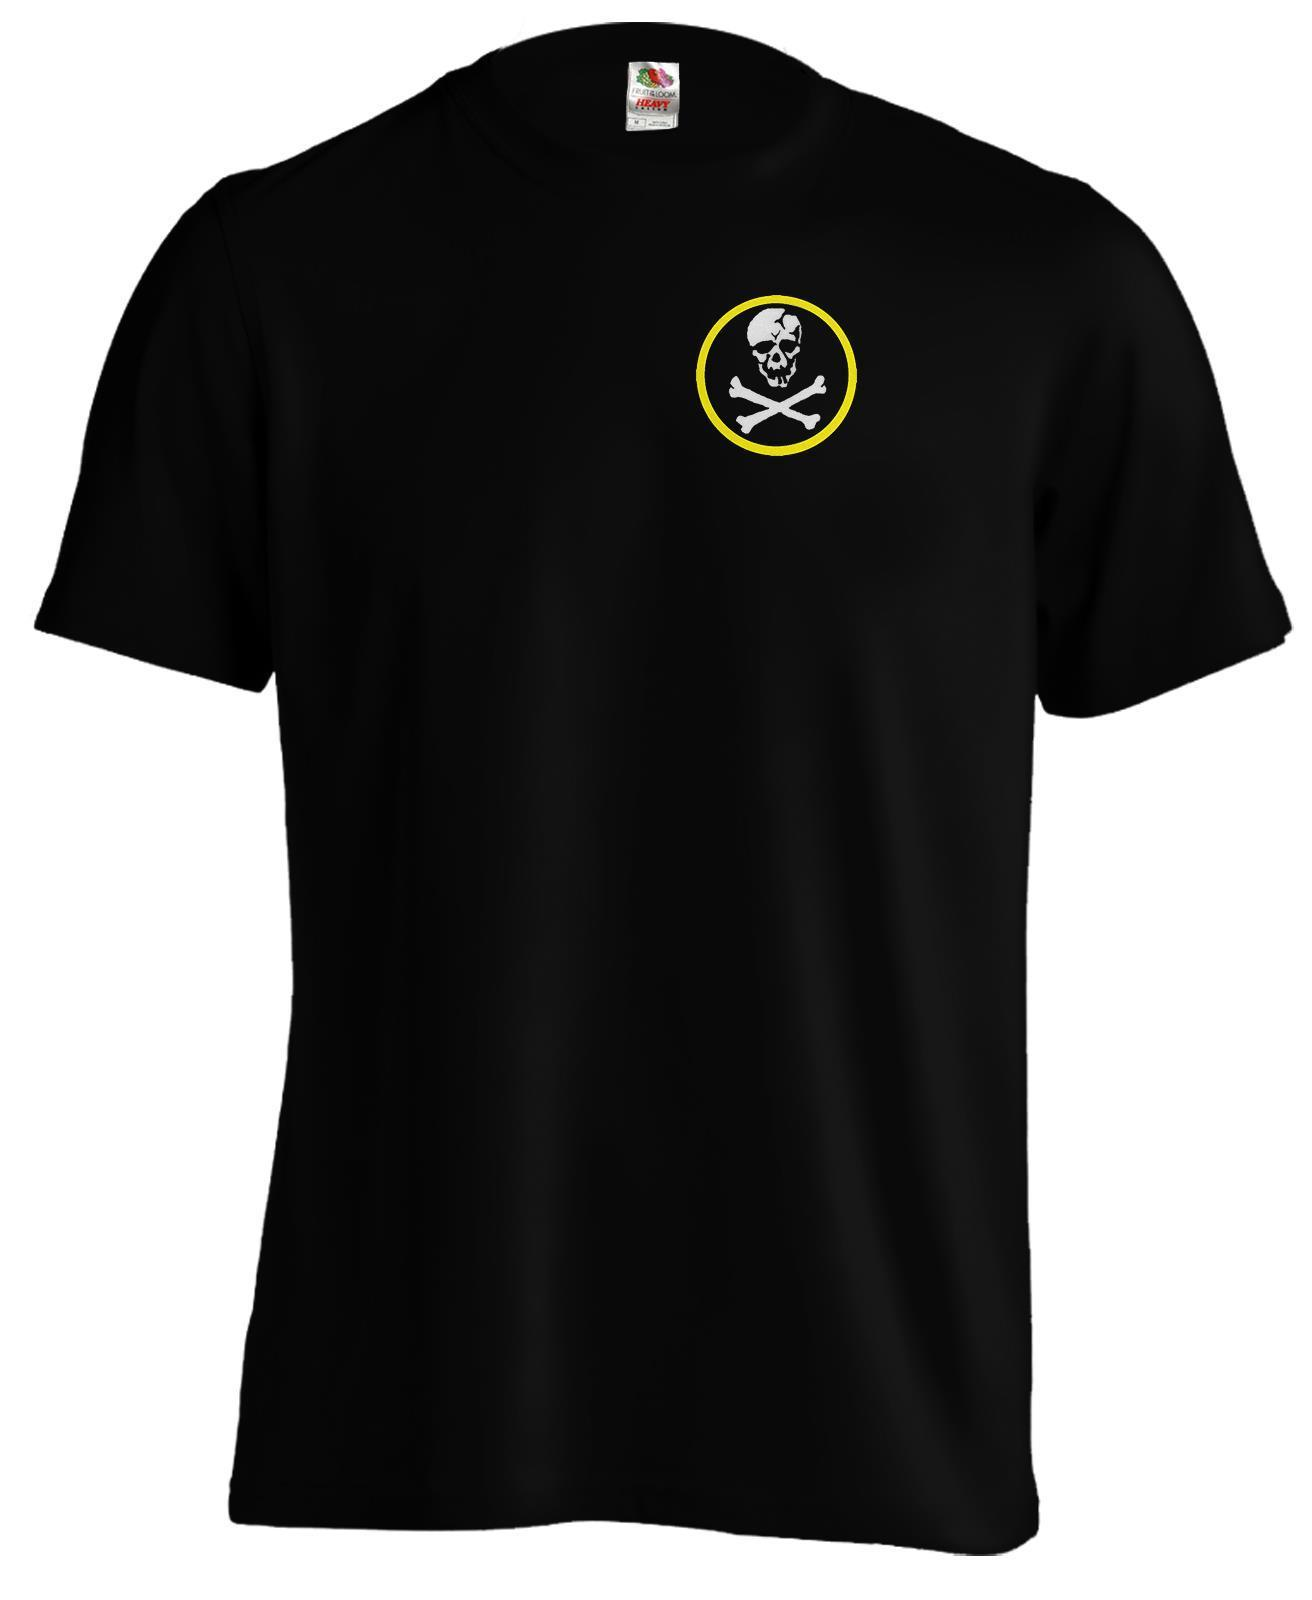 new ROBOTECH anime SKULL SQUADRON logo Classic 80s White T-shirt S to 4XLT